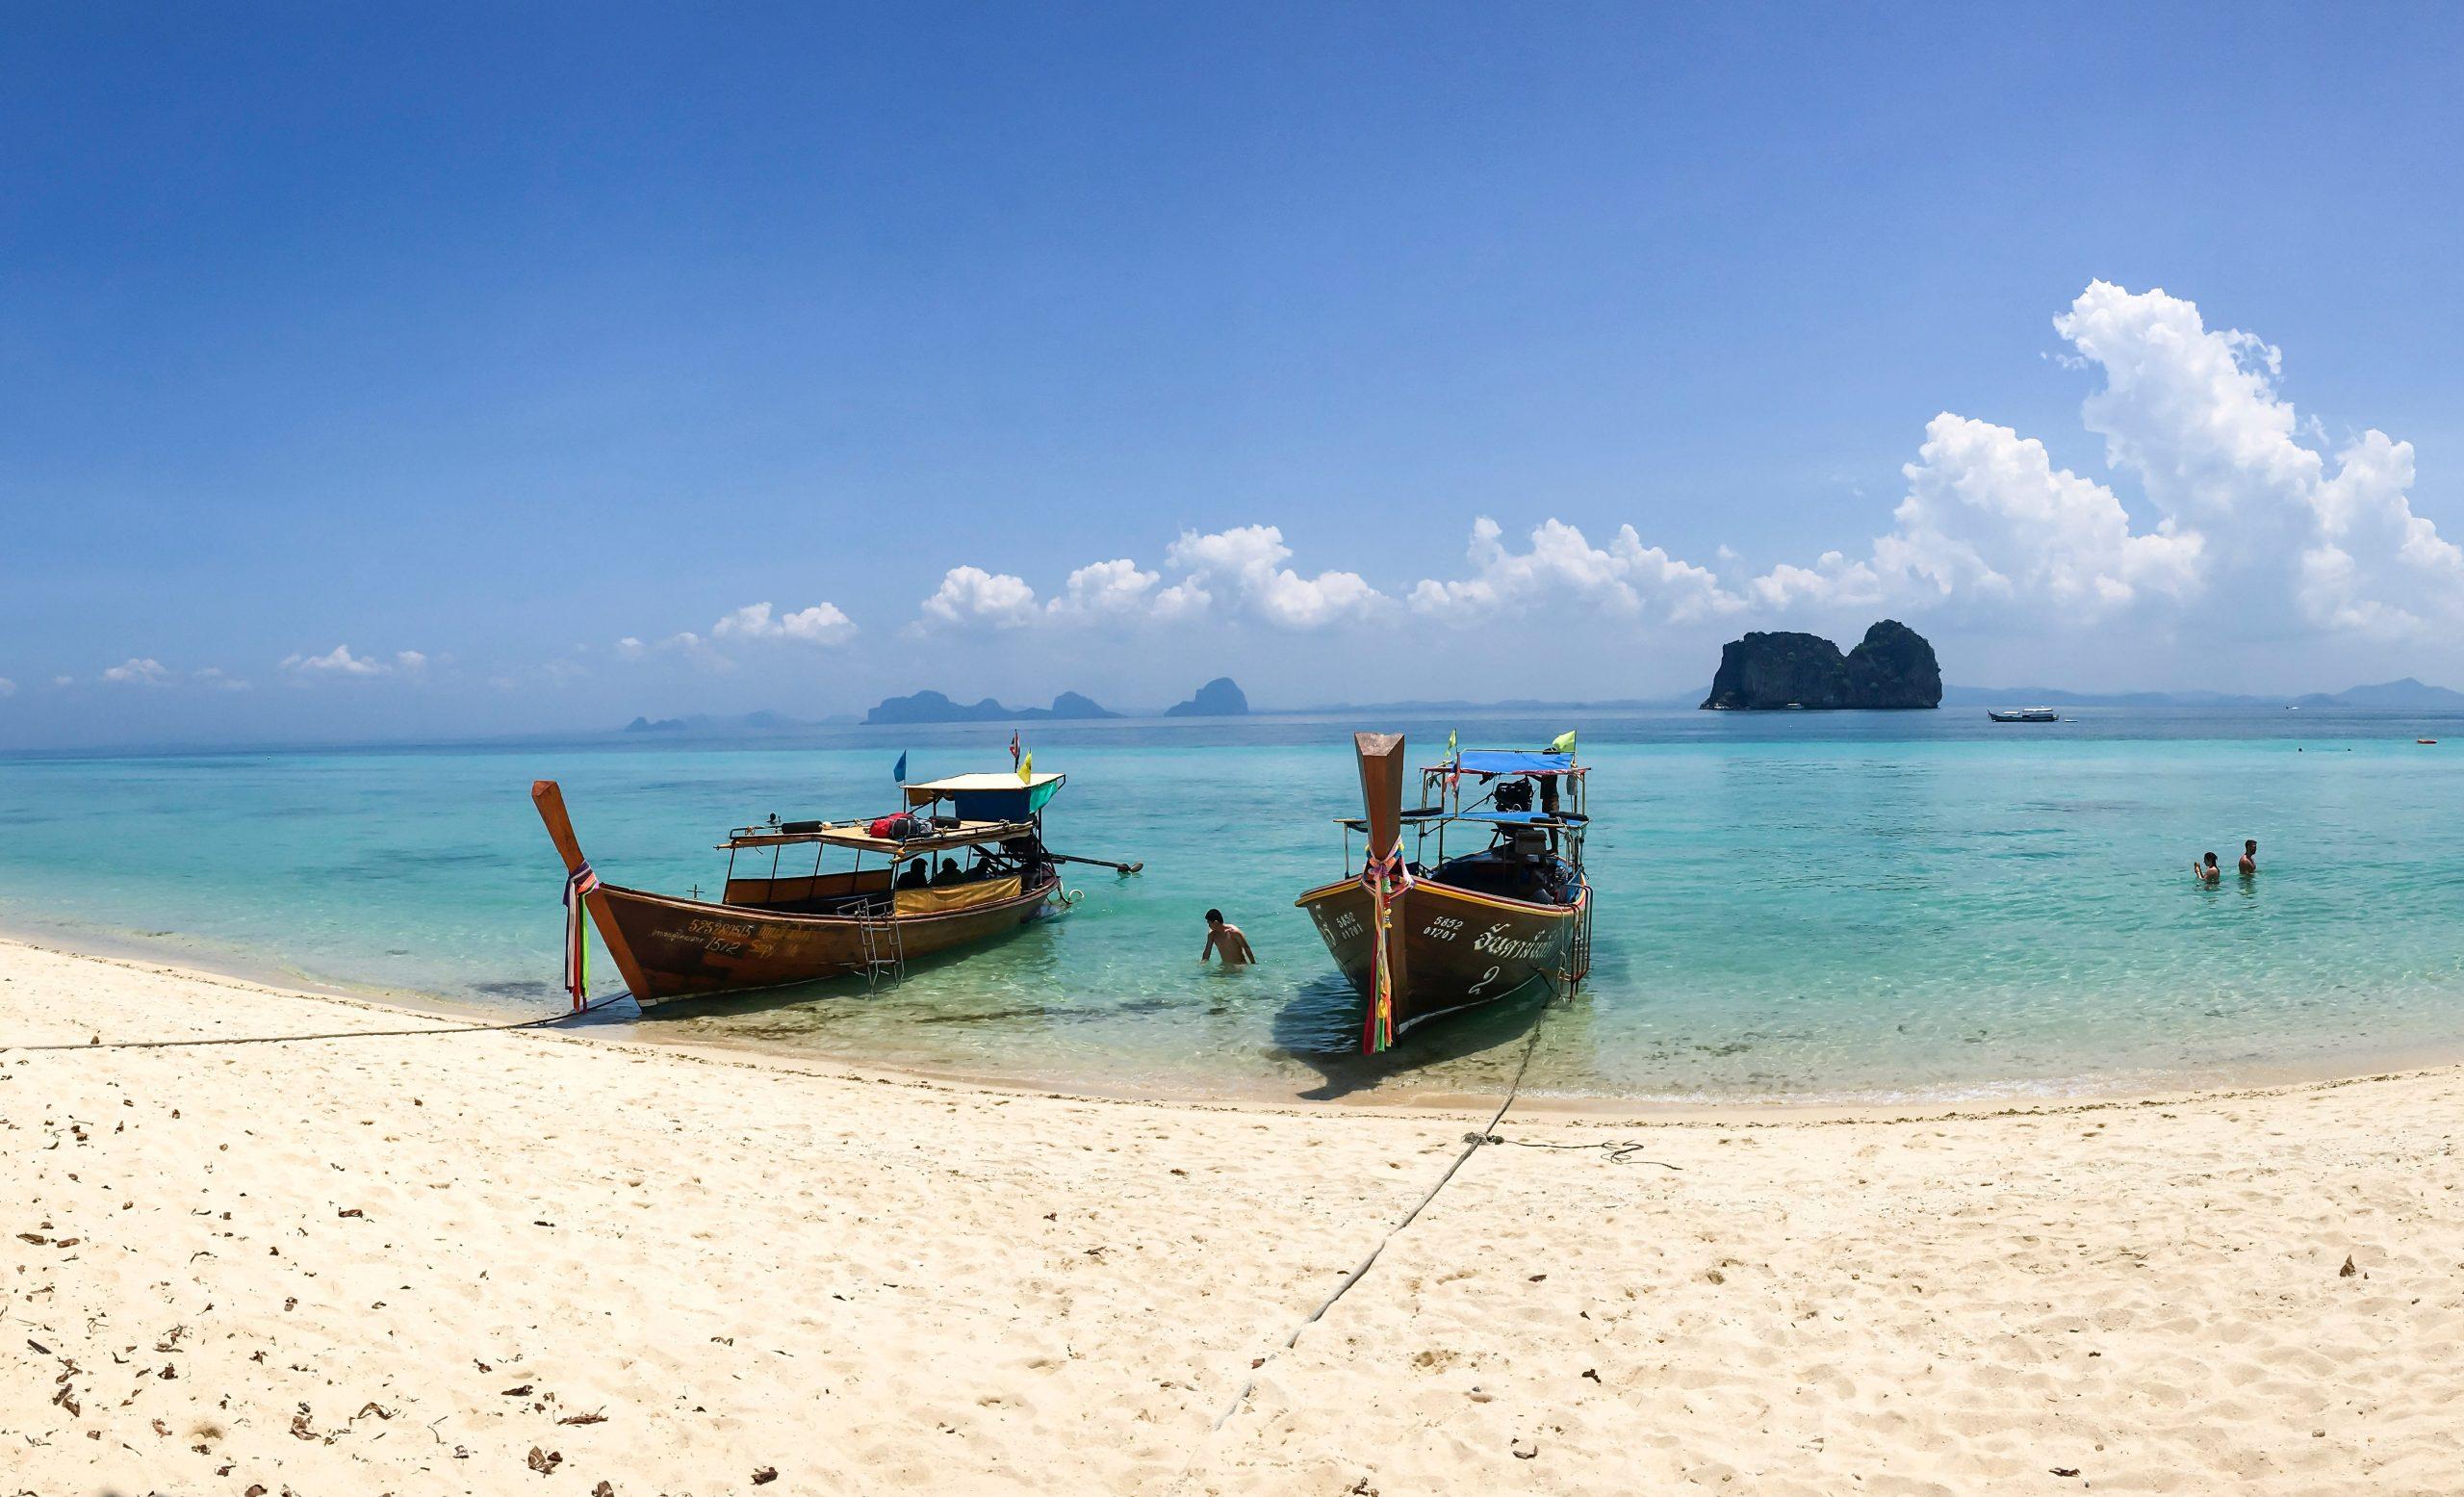 Badeurlaub steht am Plan. Ich genieße die Ruhe in Koh Lanta.